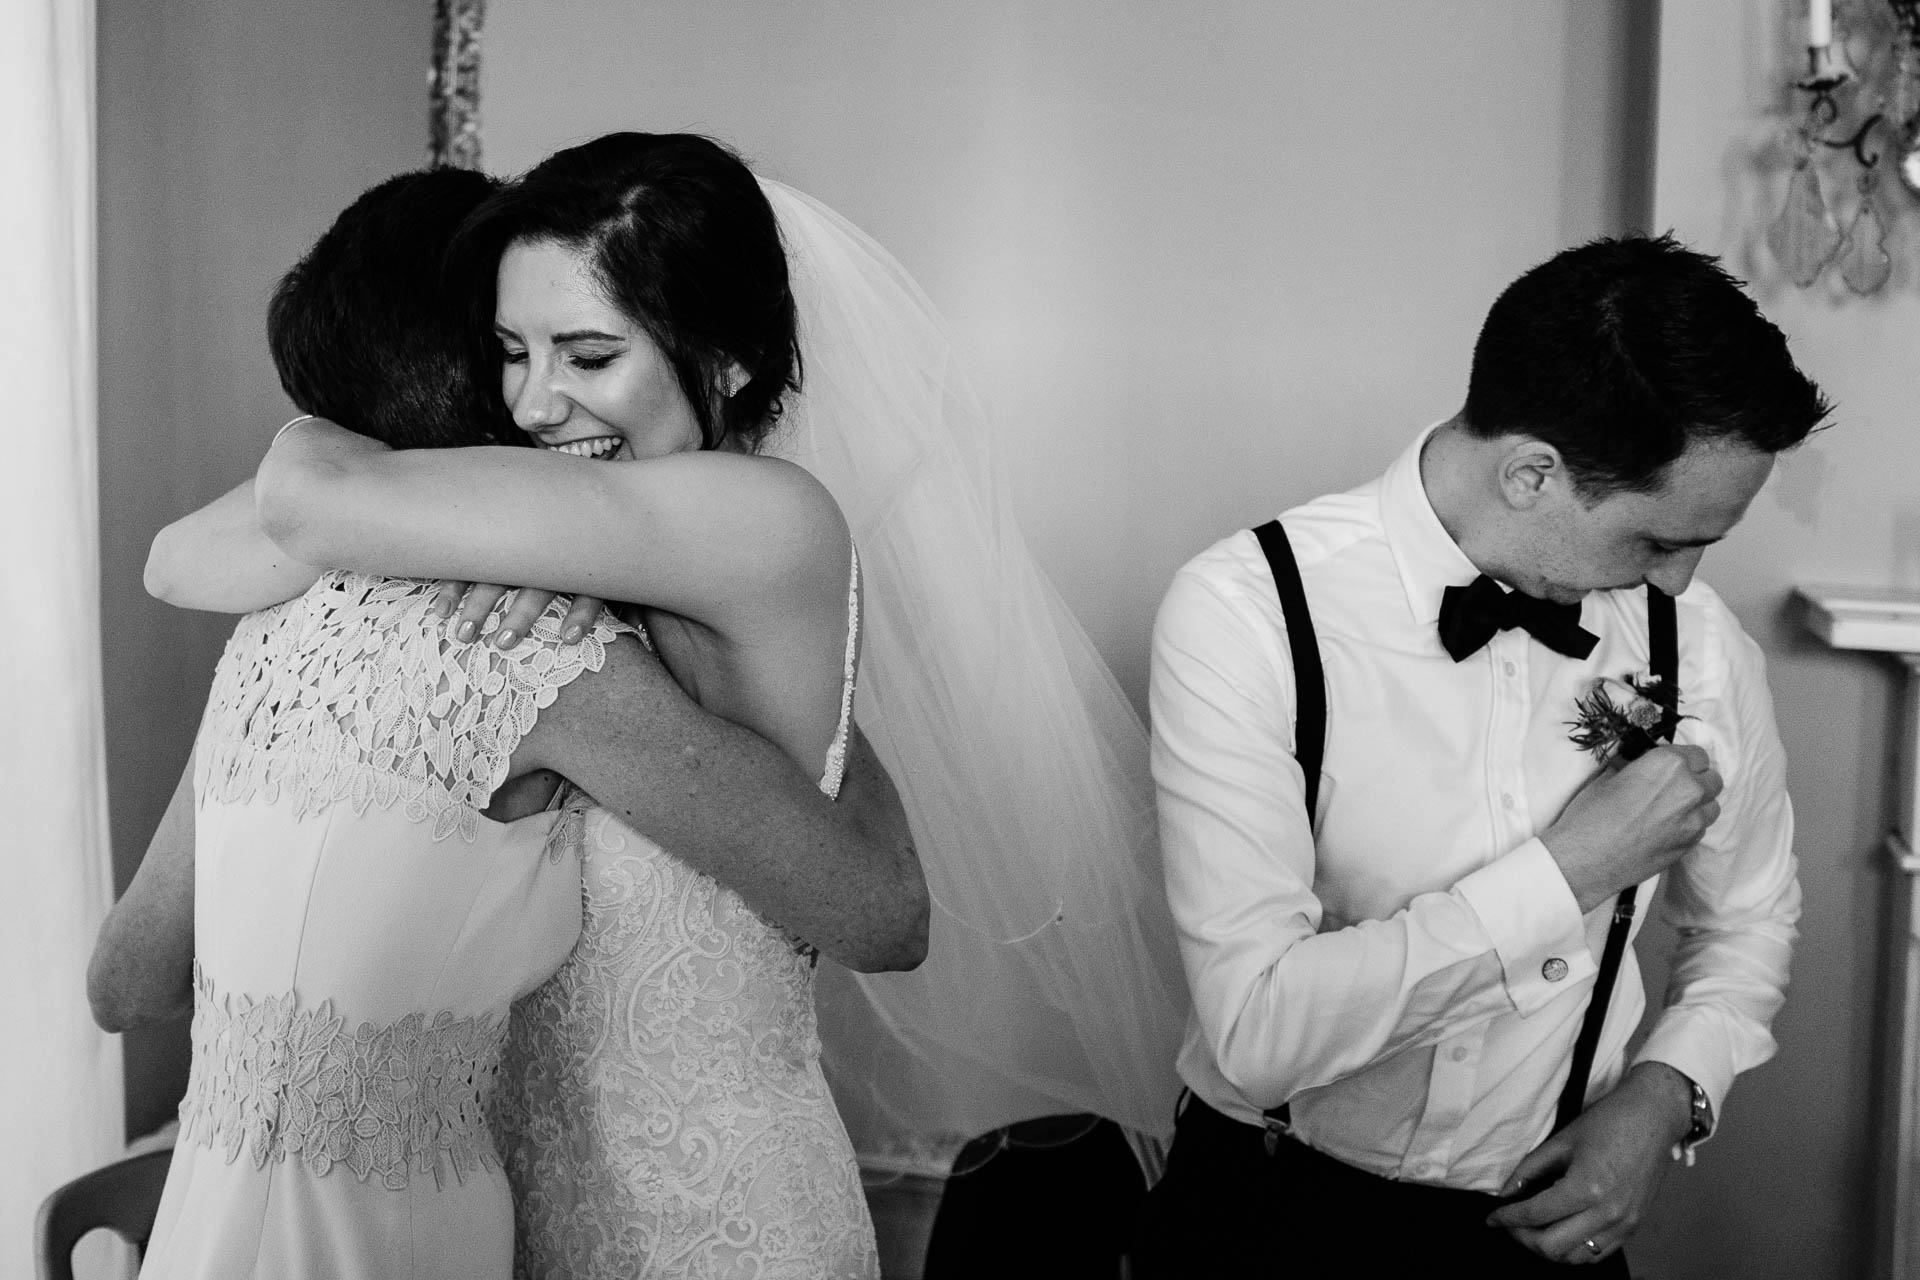 orchardleigh house wedding - Danni & Barney (411).jpg